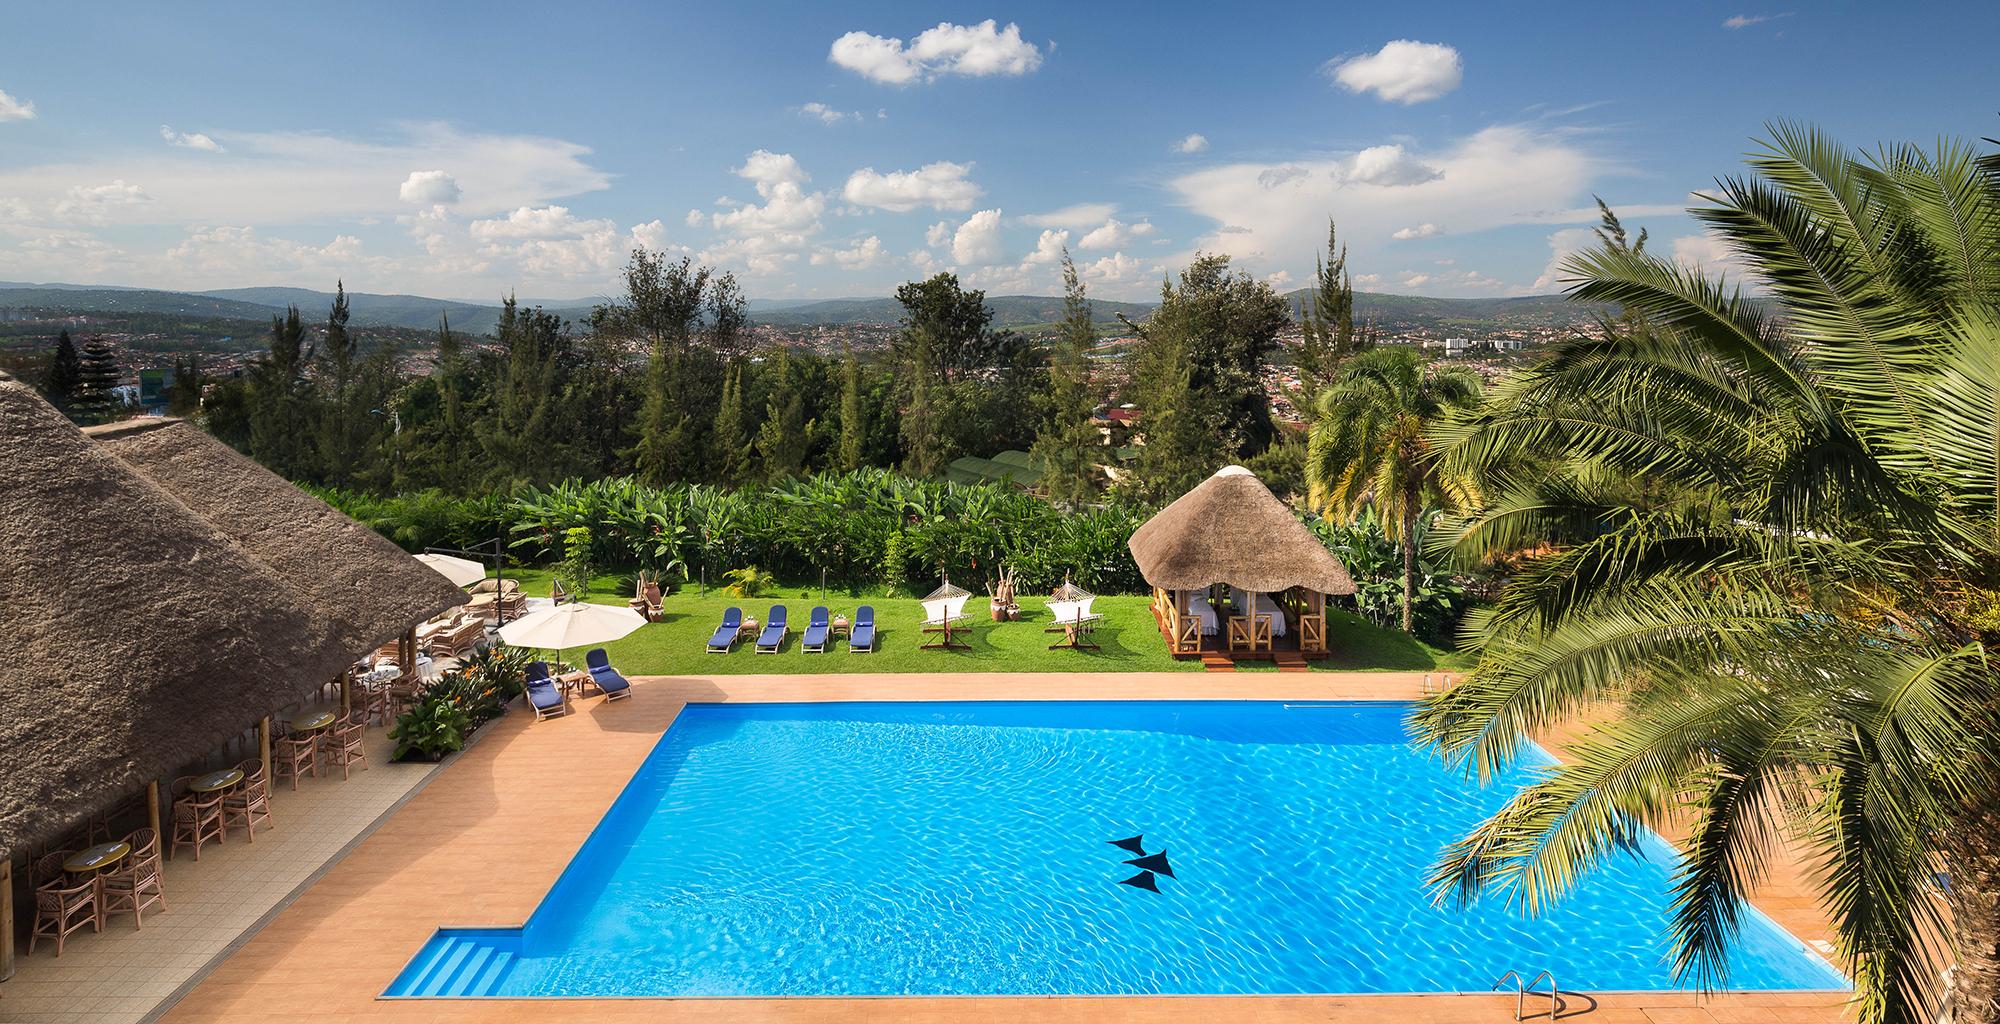 Rwanda-Hotel-Mille-Collines-Pool